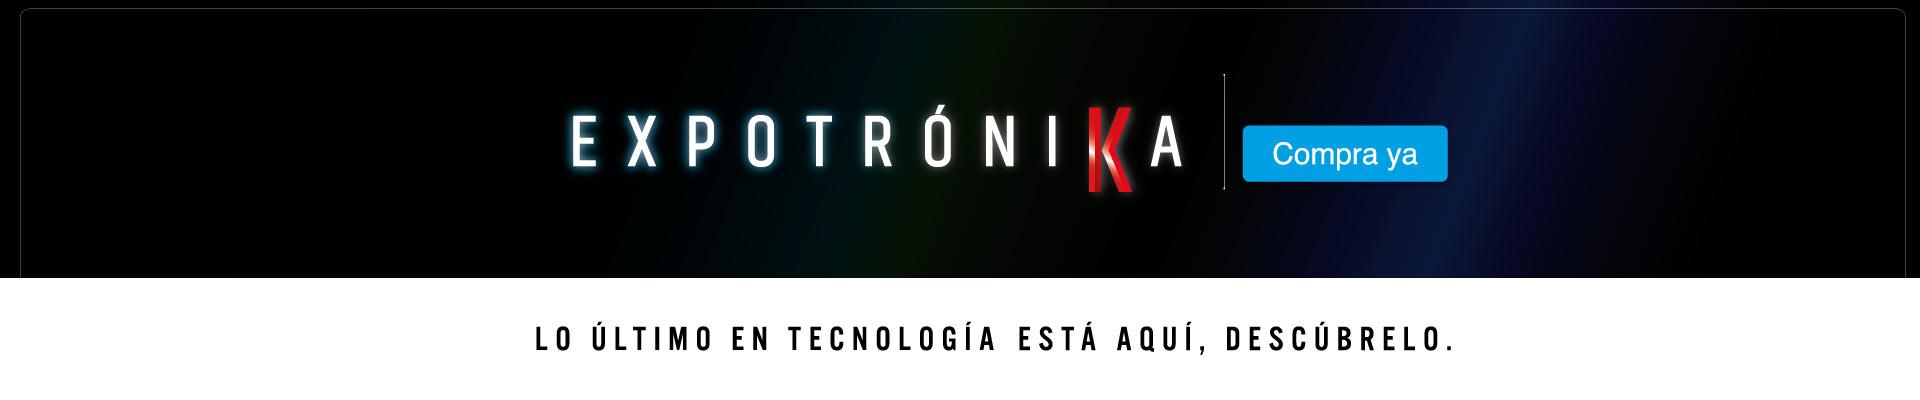 PPAL KT Expotronika 17 de mayo